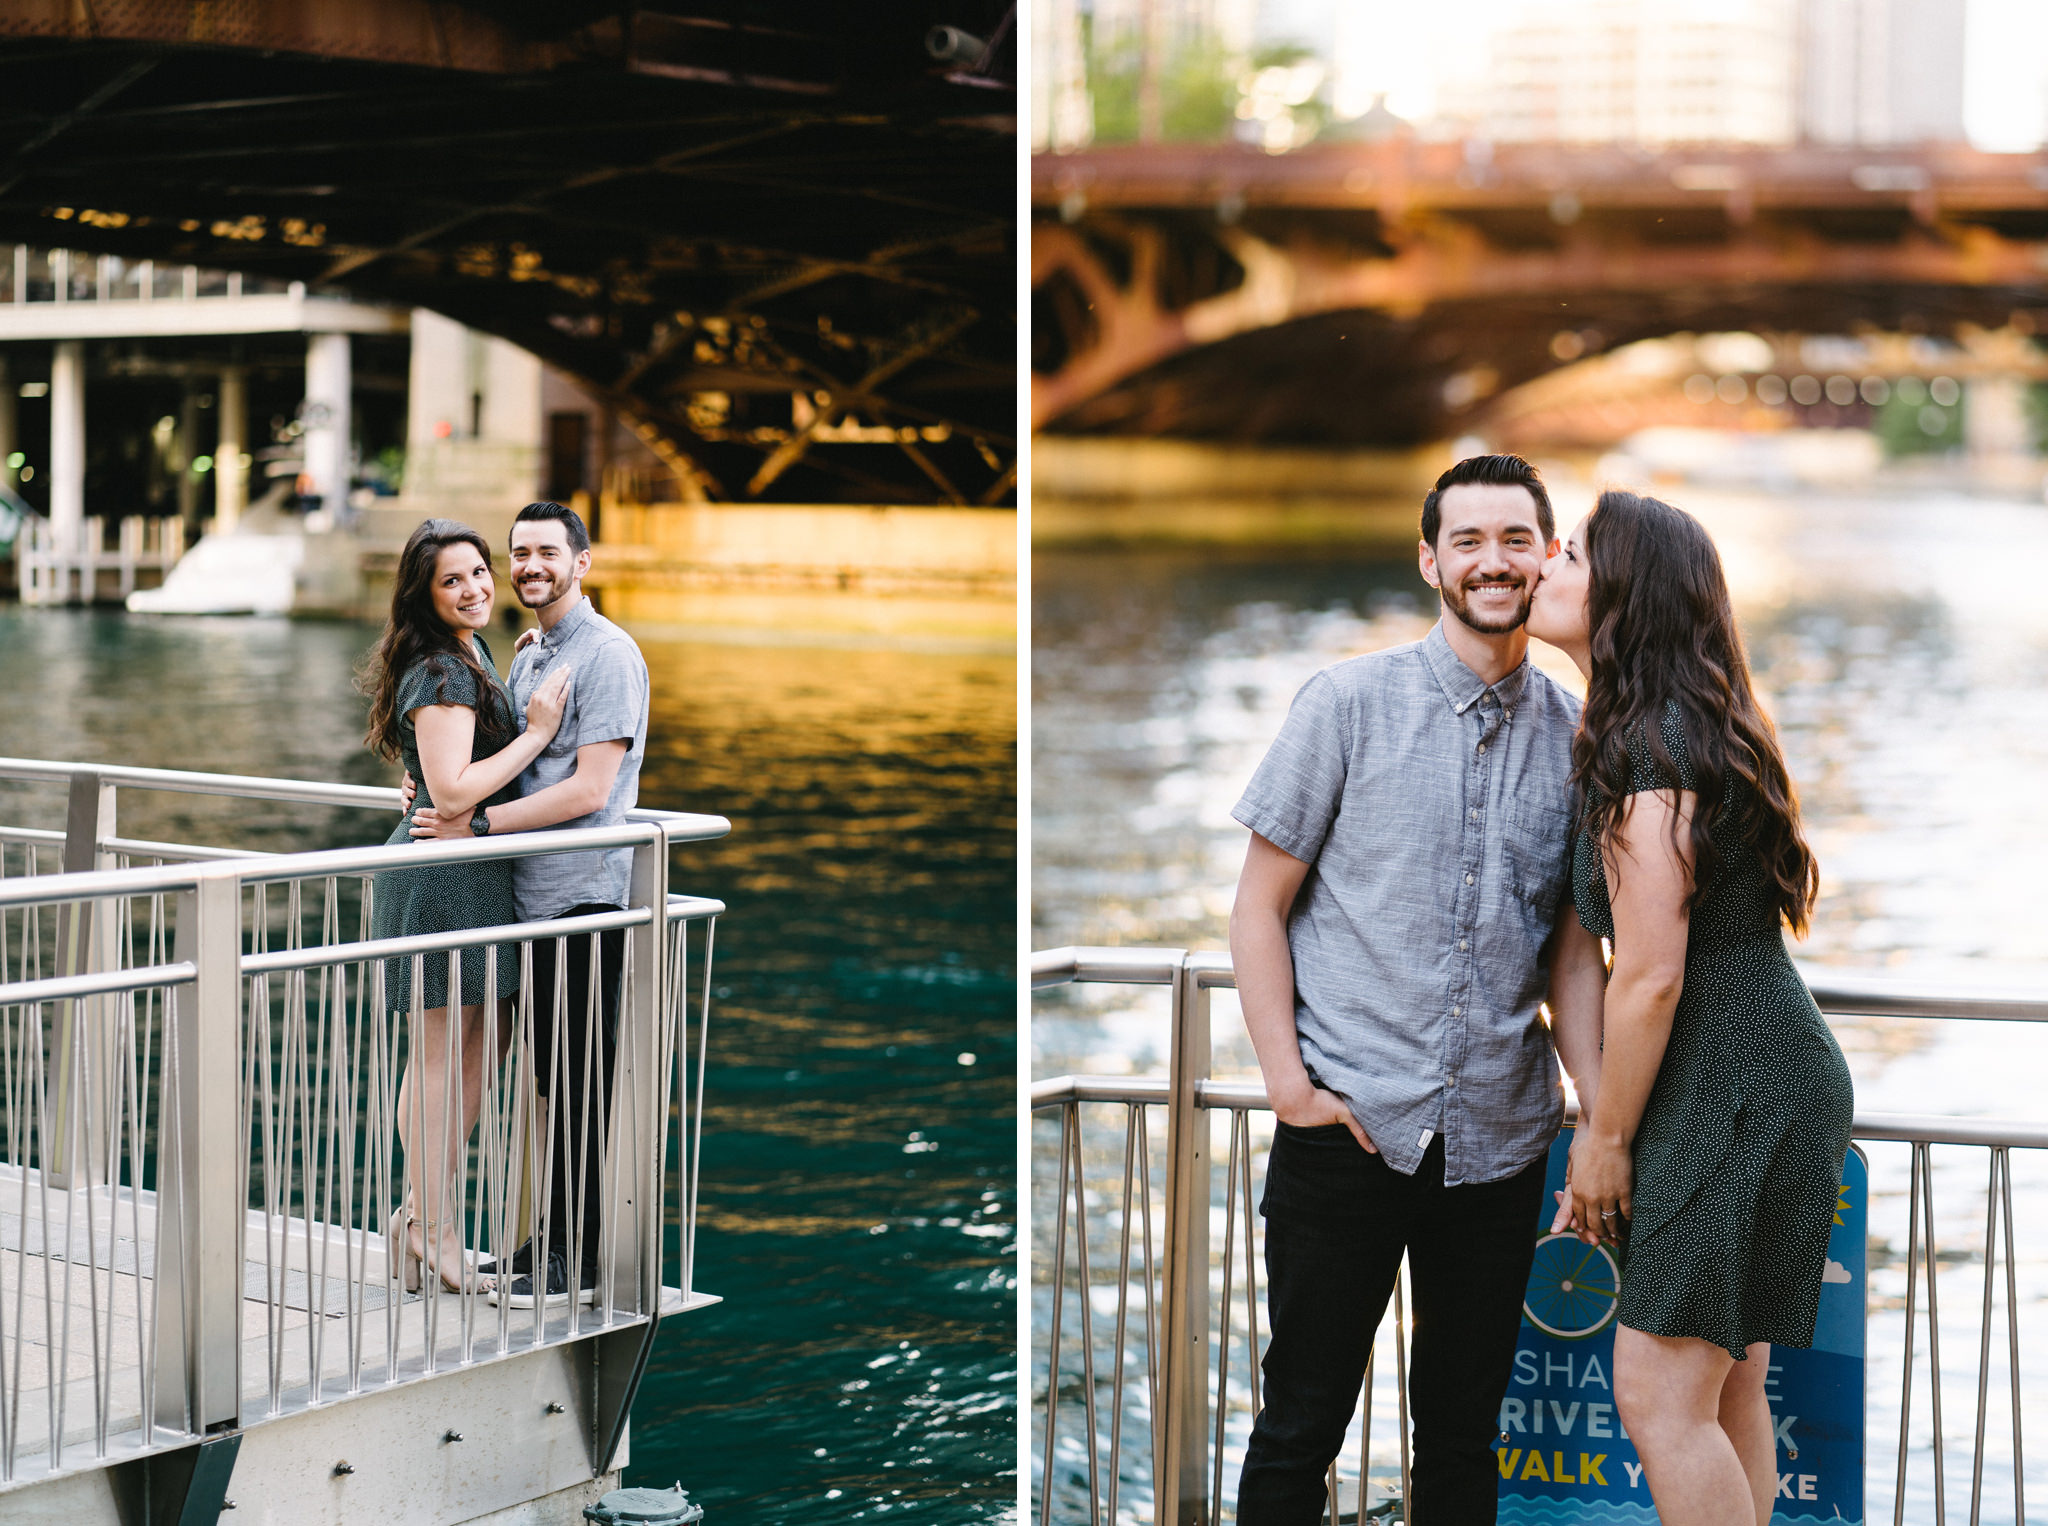 011-rempel-photography-chicago-wedding-inspiration-matt-mariana-riverwalk-engagement-session-city-view-loft-ohana-events.jpg